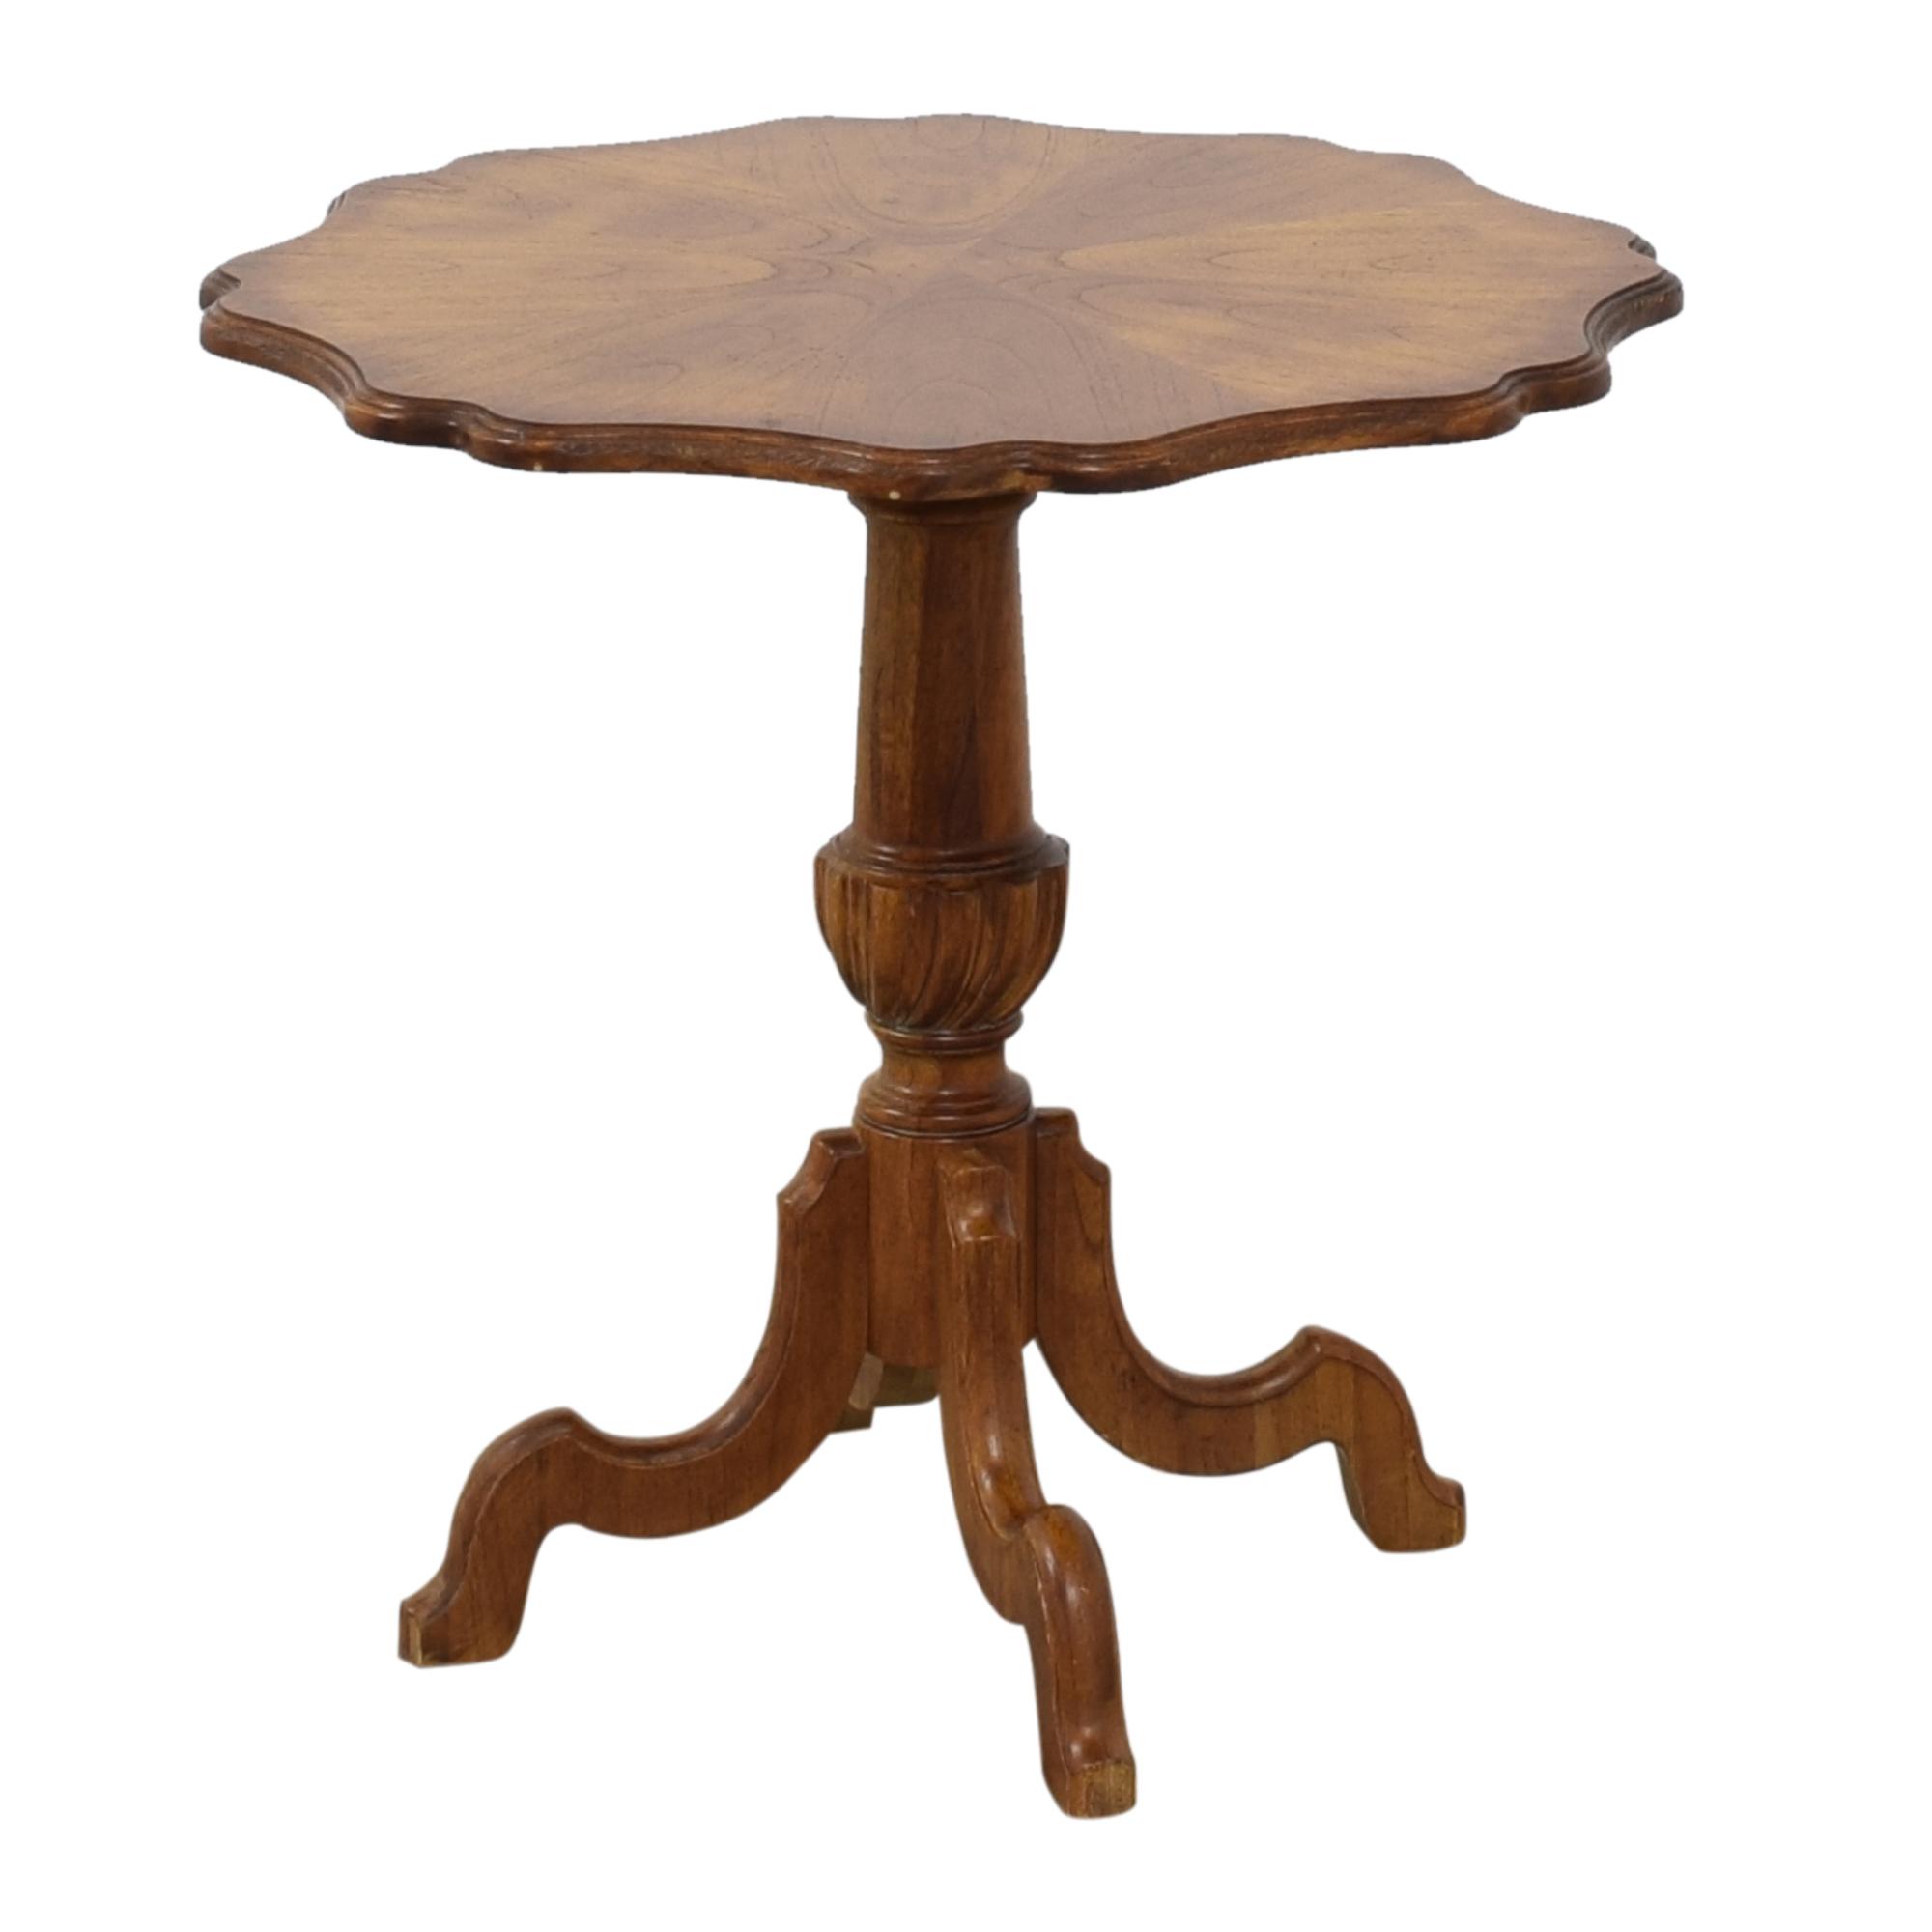 Hekman Furniture Hekman Furniture Pie Crust Table coupon